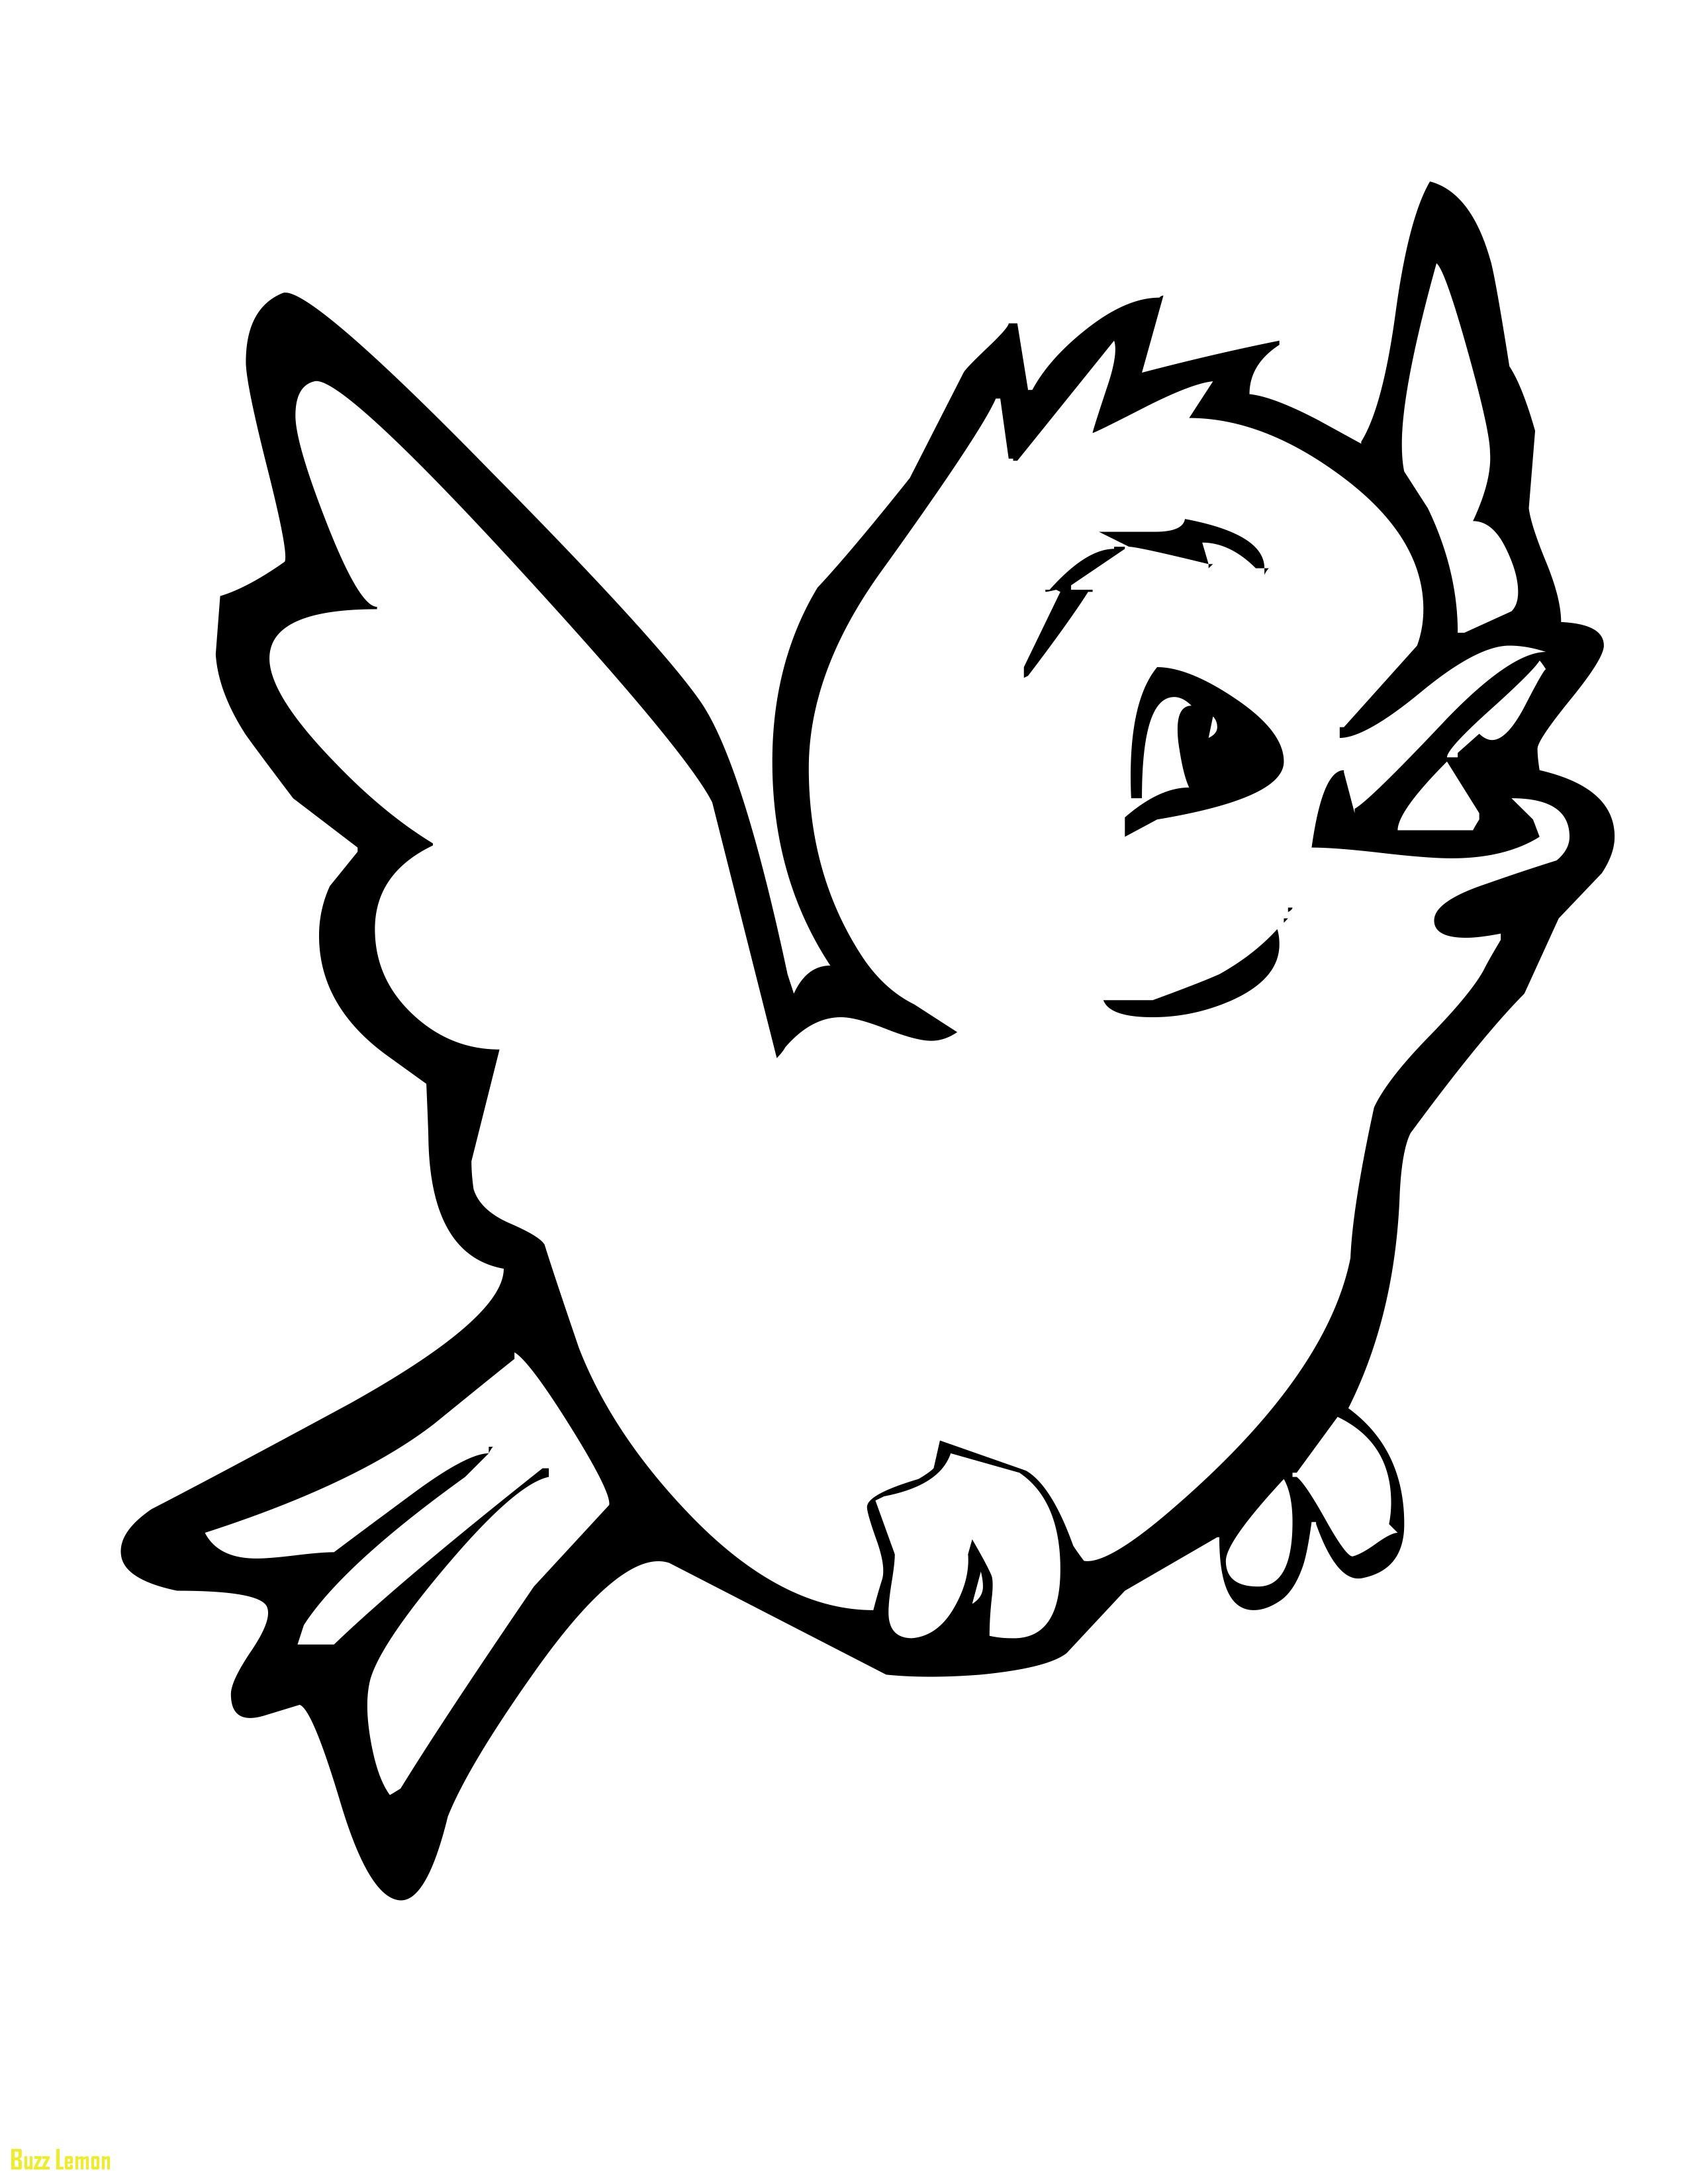 2550x3300 Easy Bird Coloring Pages Copy Elegant Excellent Bird Coloring